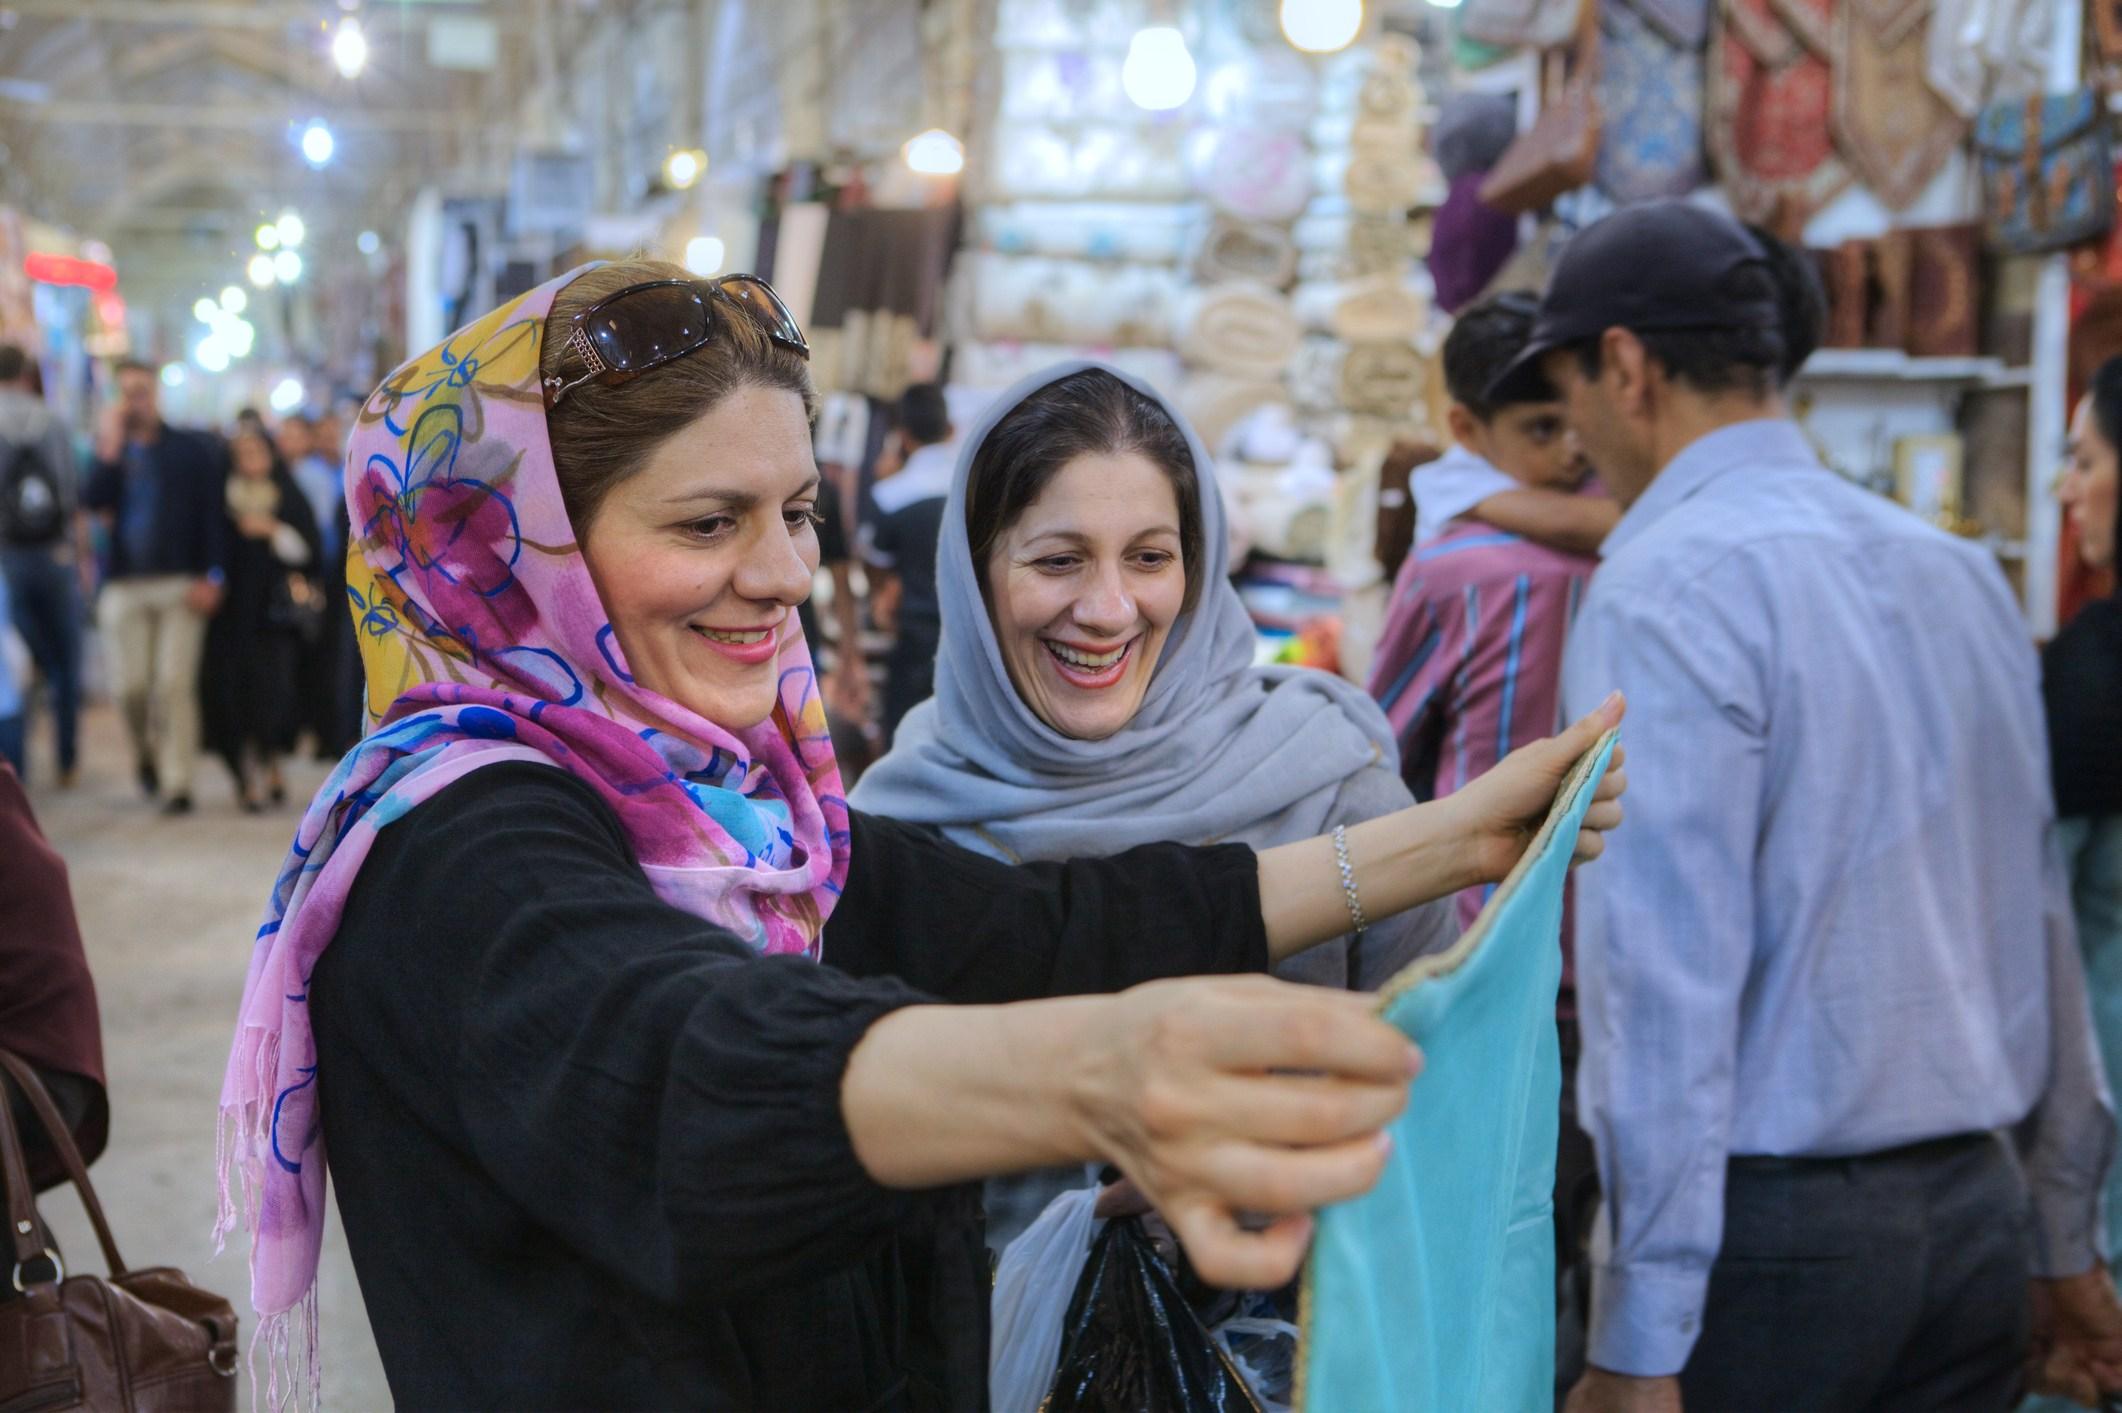 Women in hijab choose fabric in city market, Shiraz, Iran.